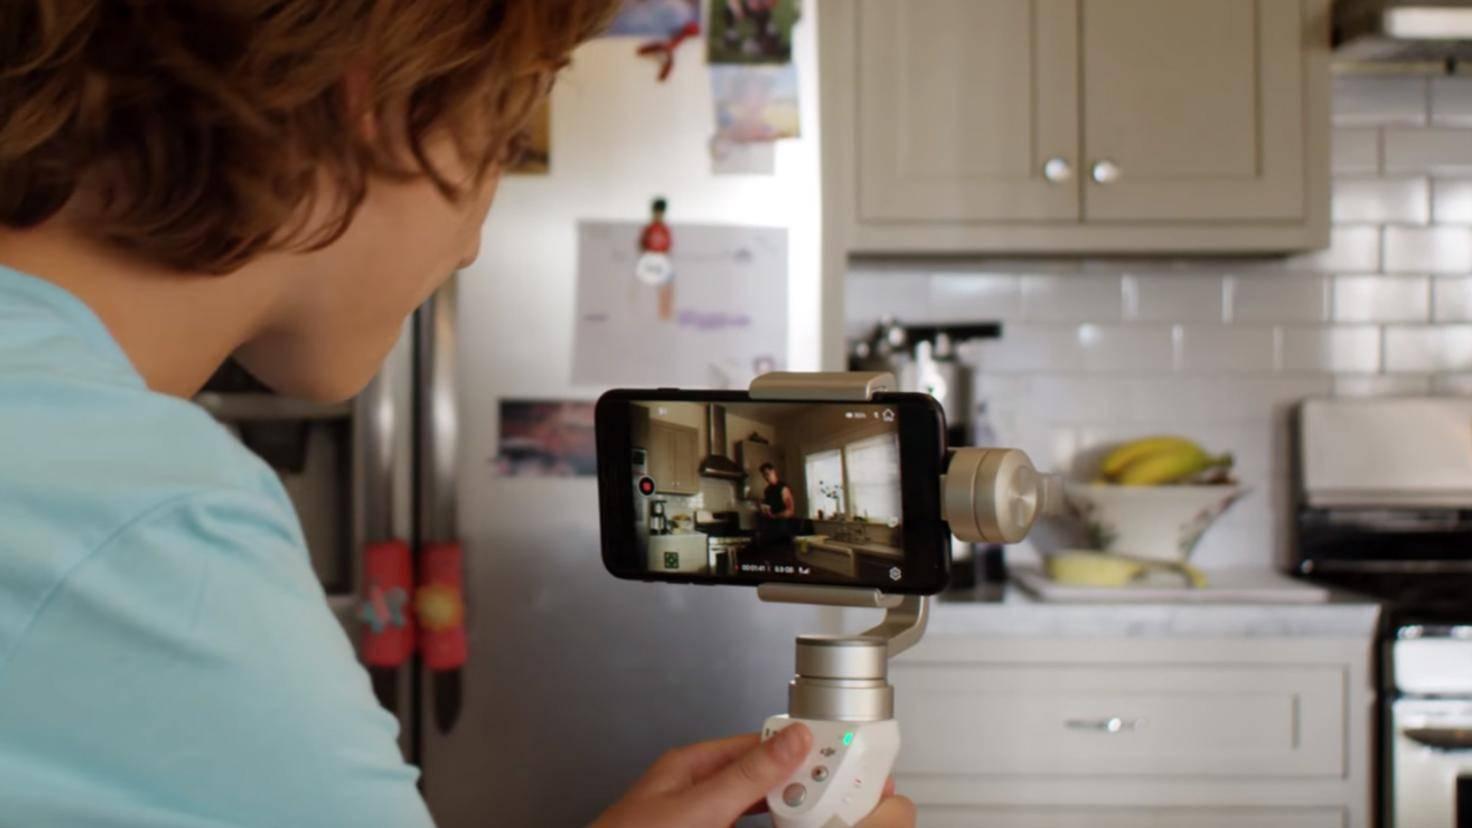 iPhone Videos